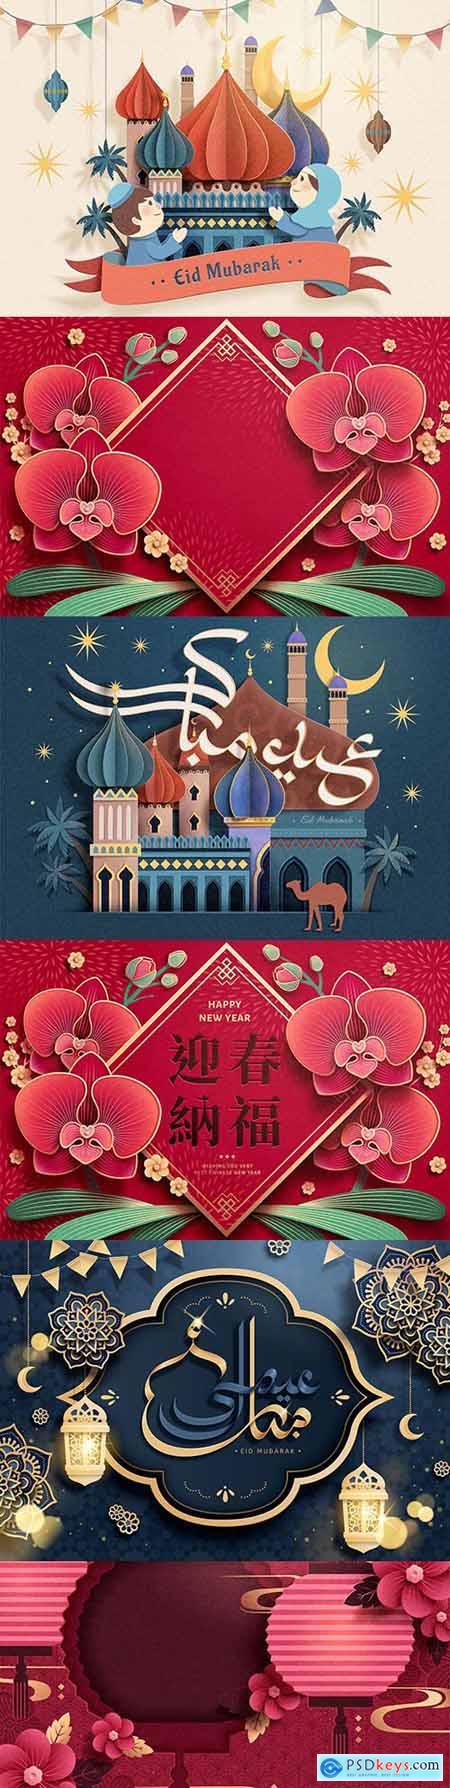 Elegant orchid flower and Eid Mubarak happy holiday